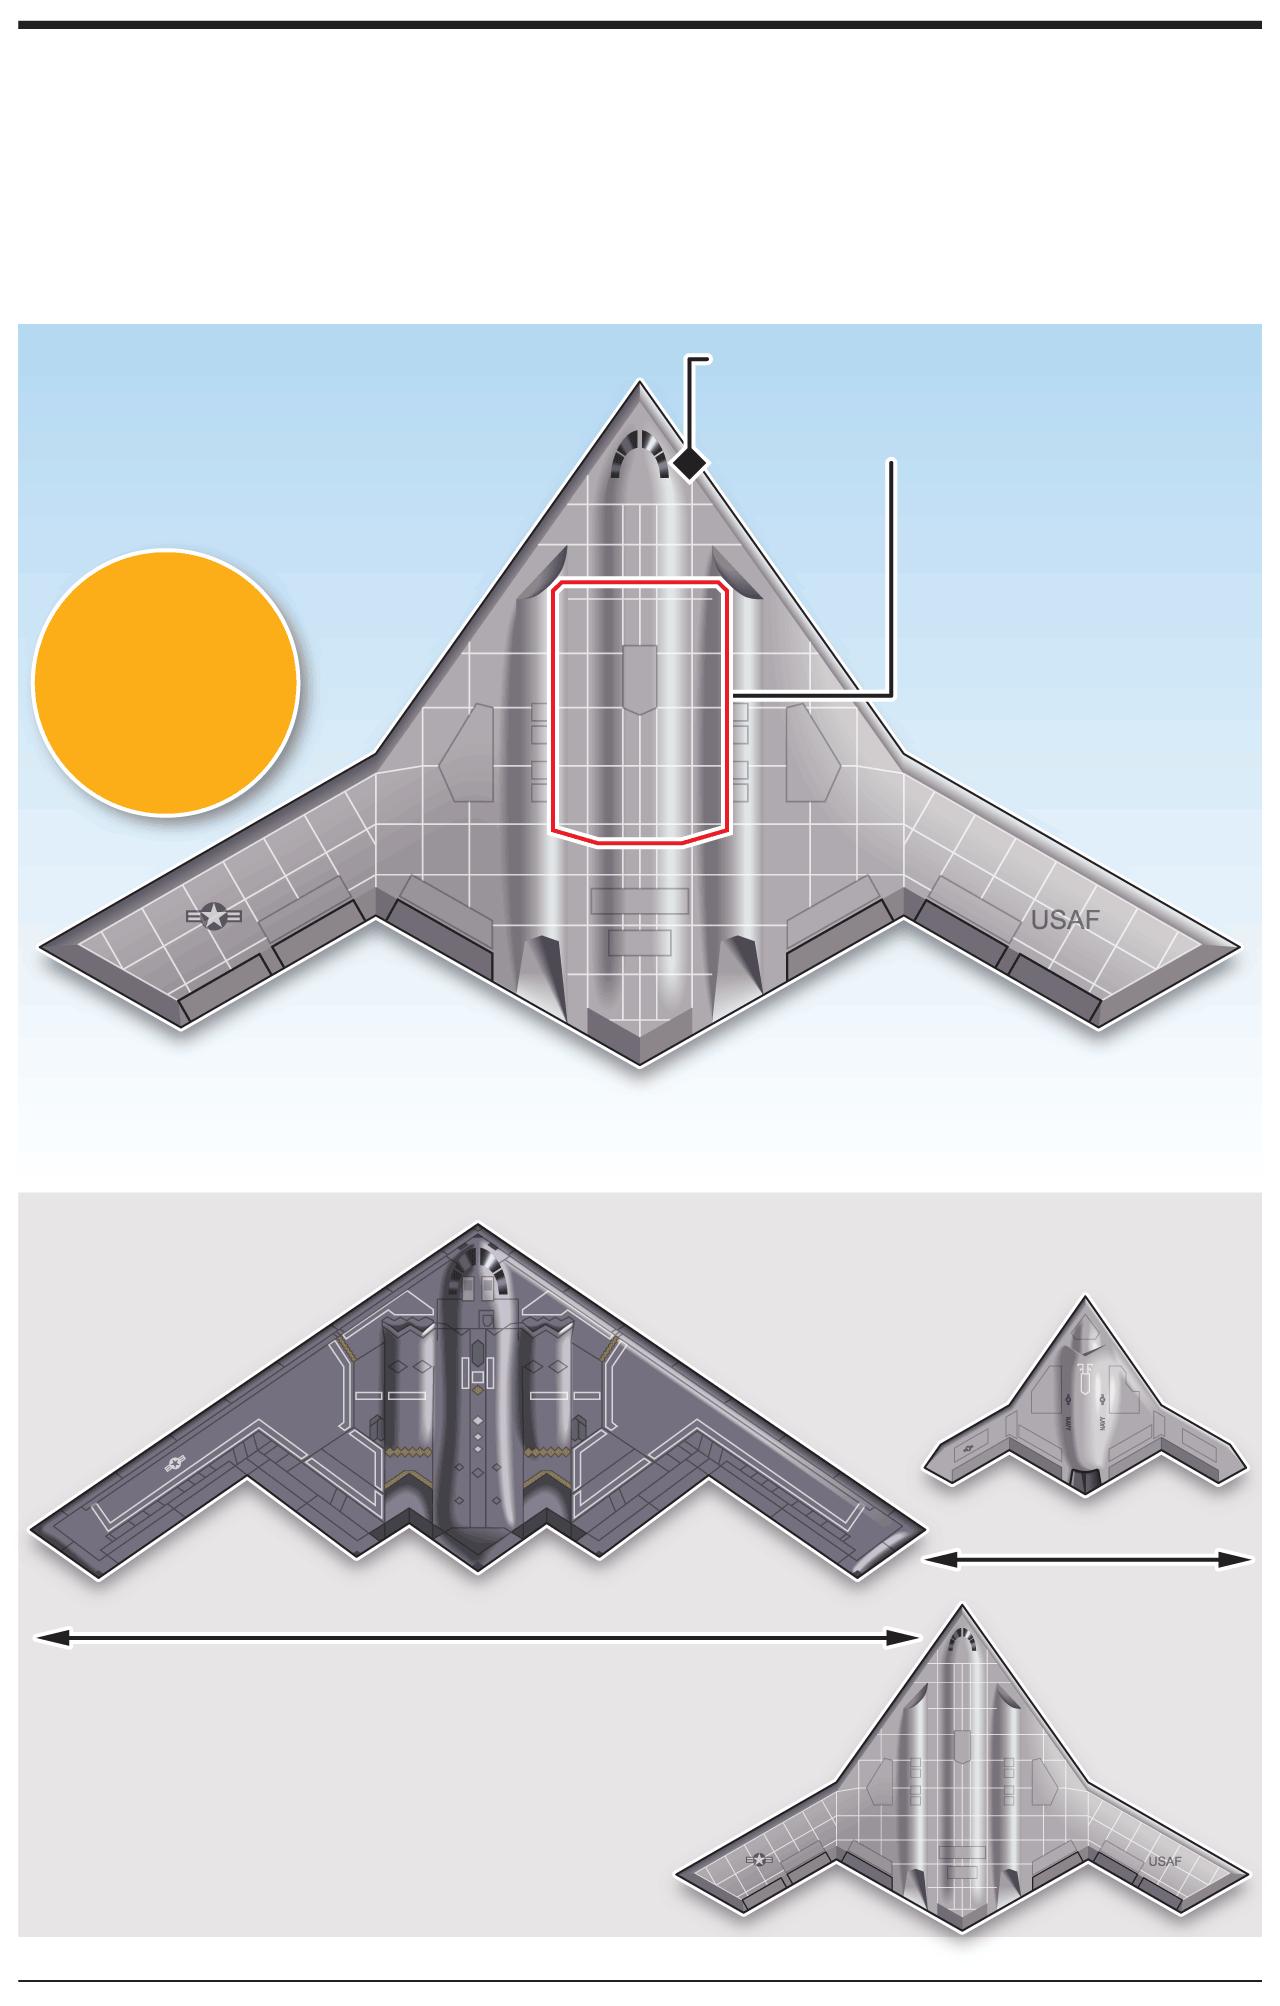 AVIATION: U.S. long-range strike bomber infographic